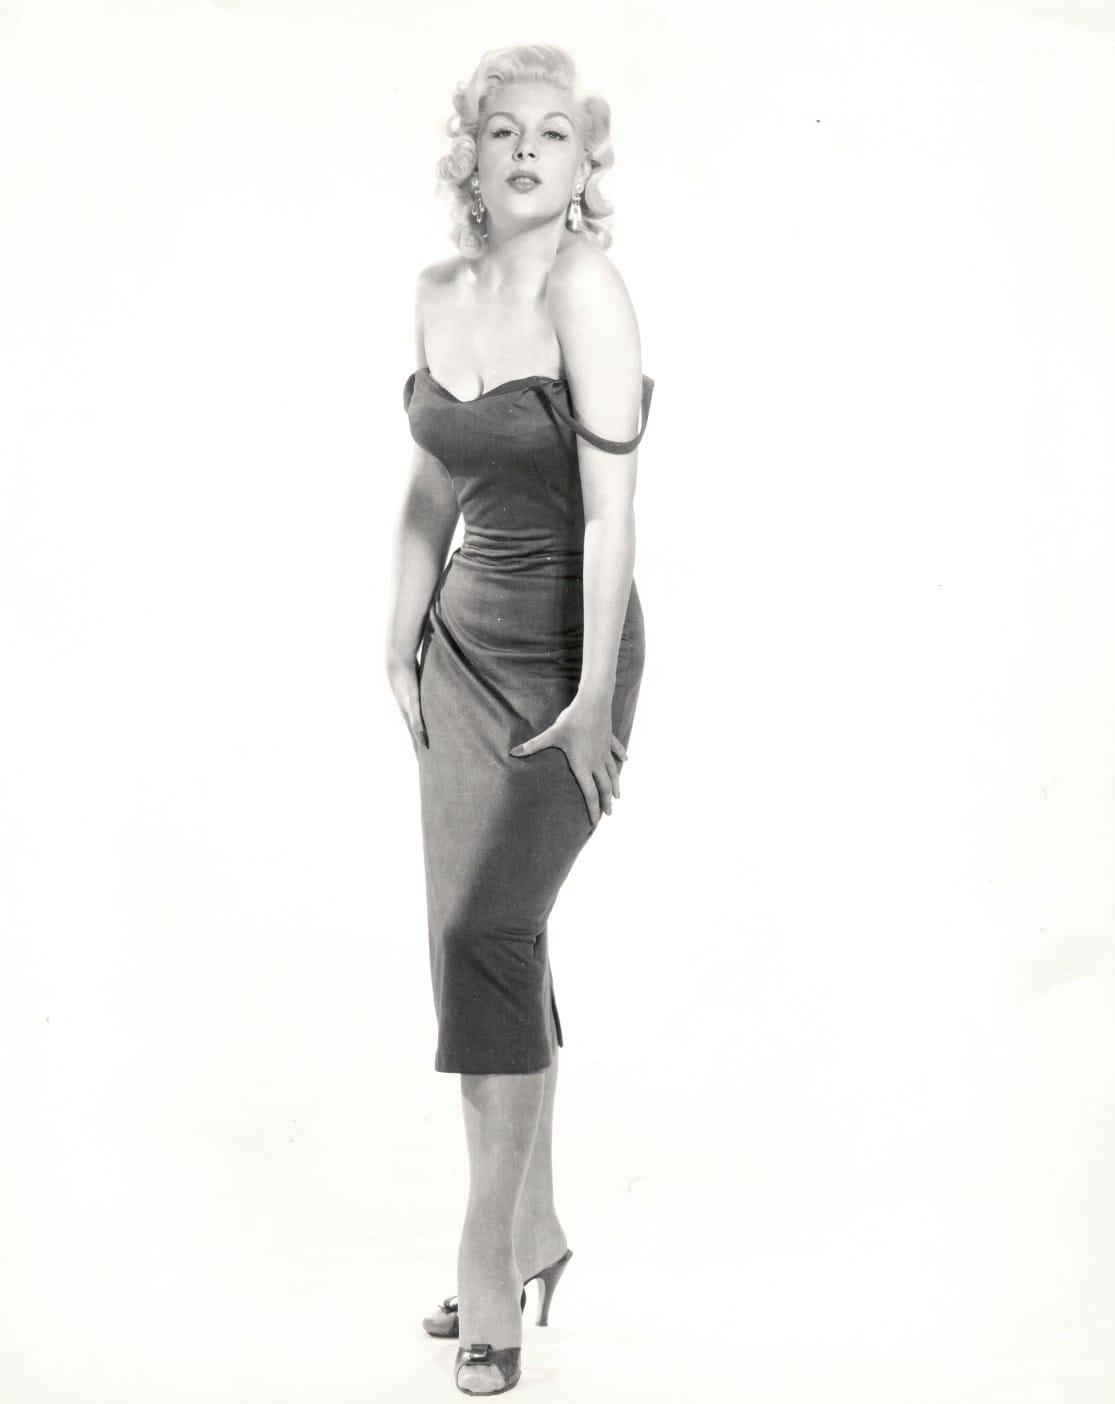 Trish Goff USA 3 1999?001,Maxi Mounds Porno pic Florence Henderson born February 14, 1934,Amy Locane